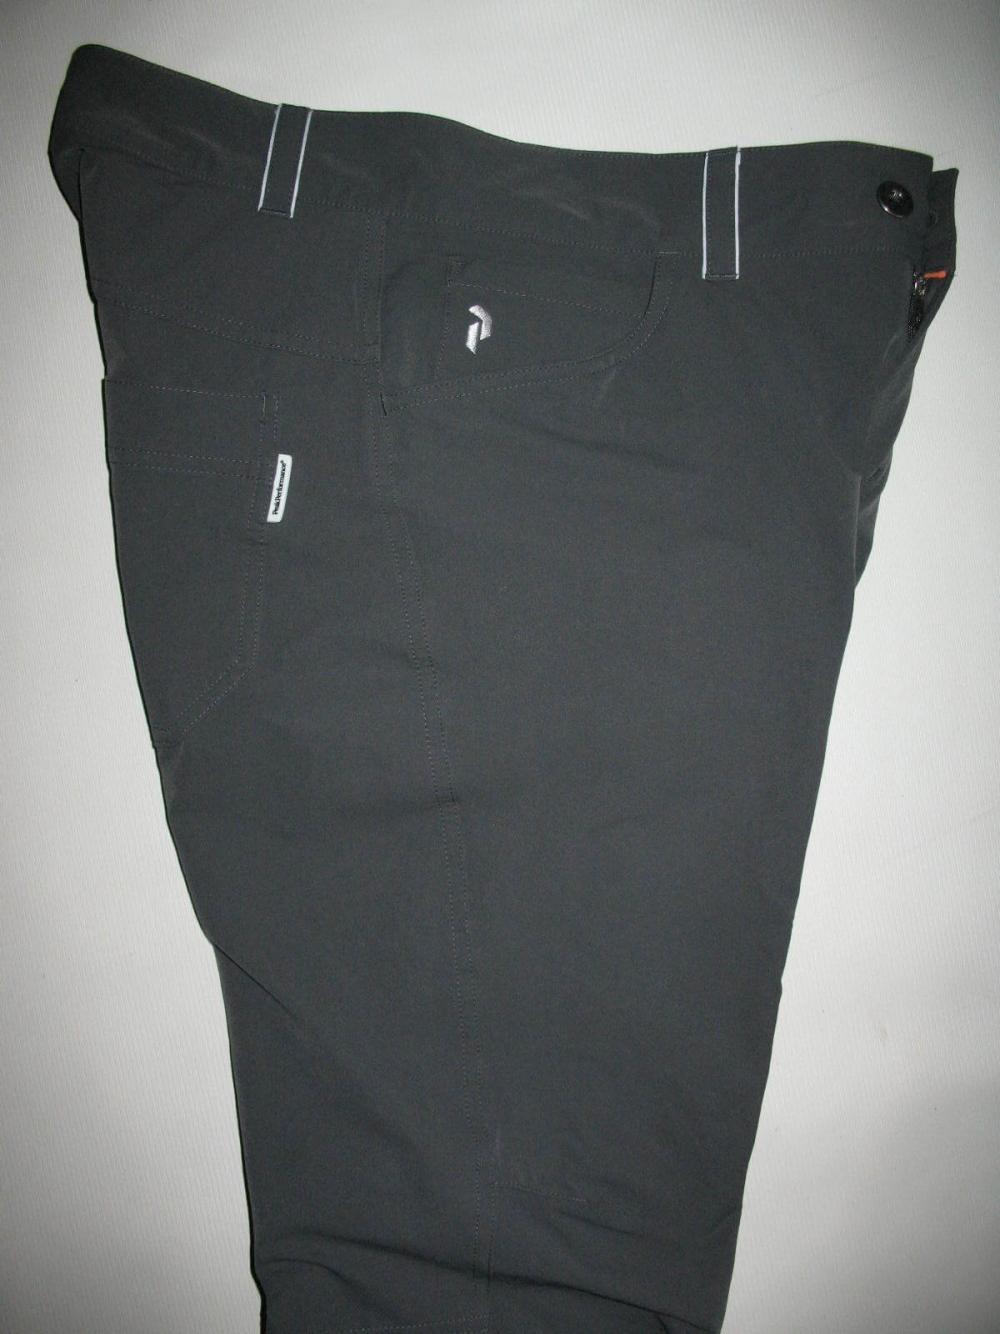 Штаны PEAK PERFOMANCE agile pants lady/unisex (размер S/M) - 7